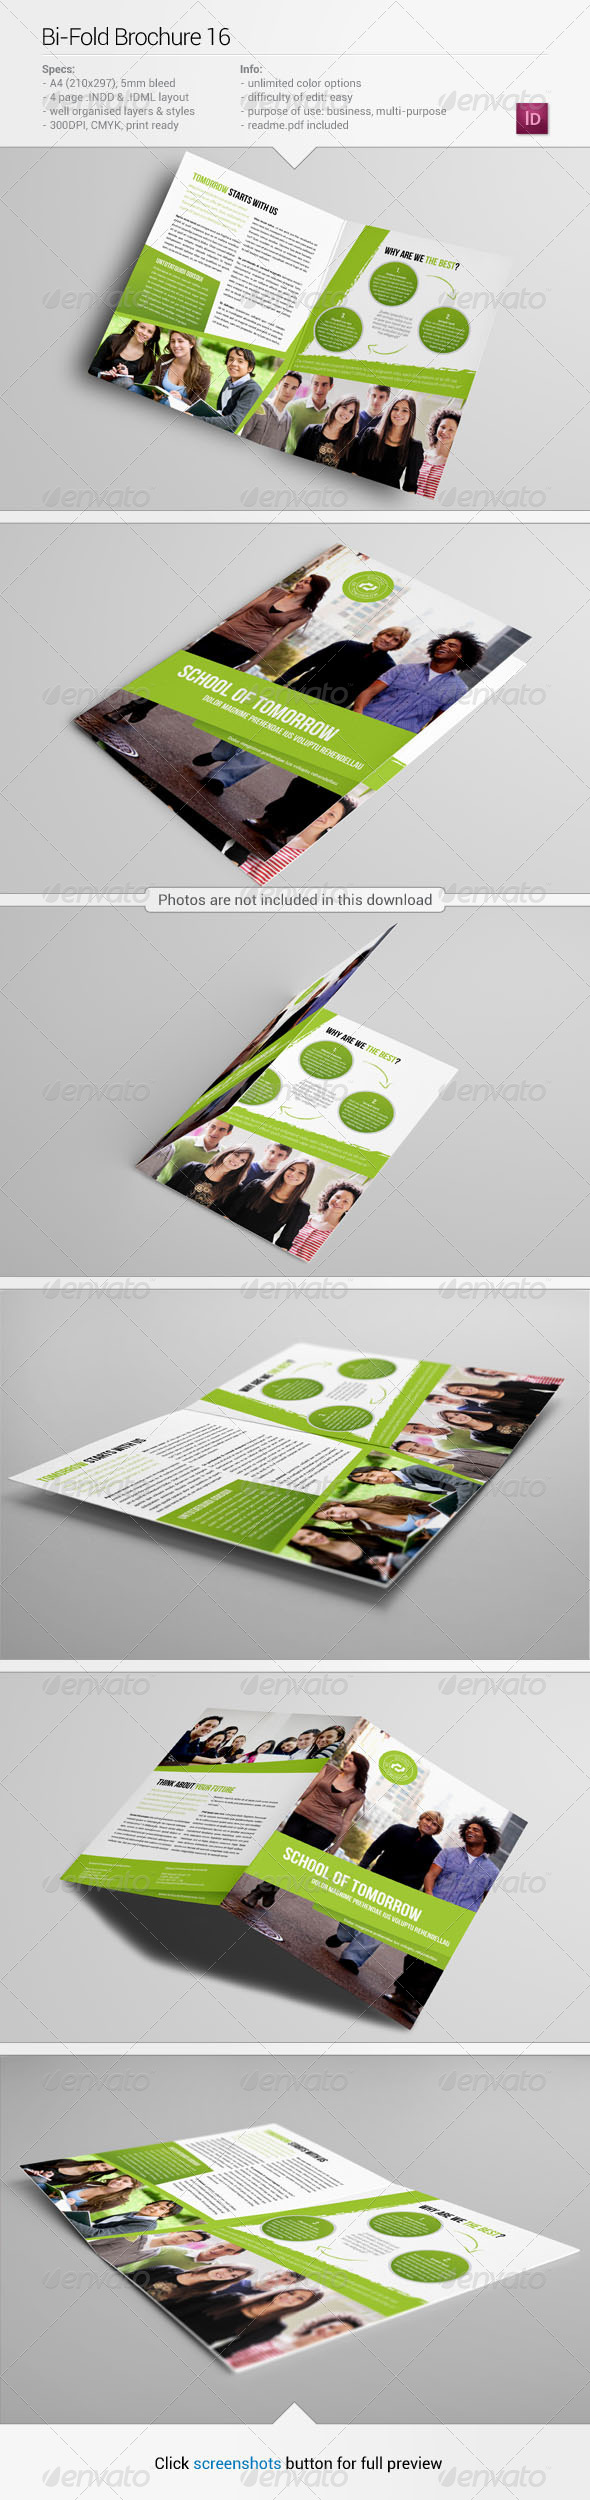 Bi-Fold Brochure 16